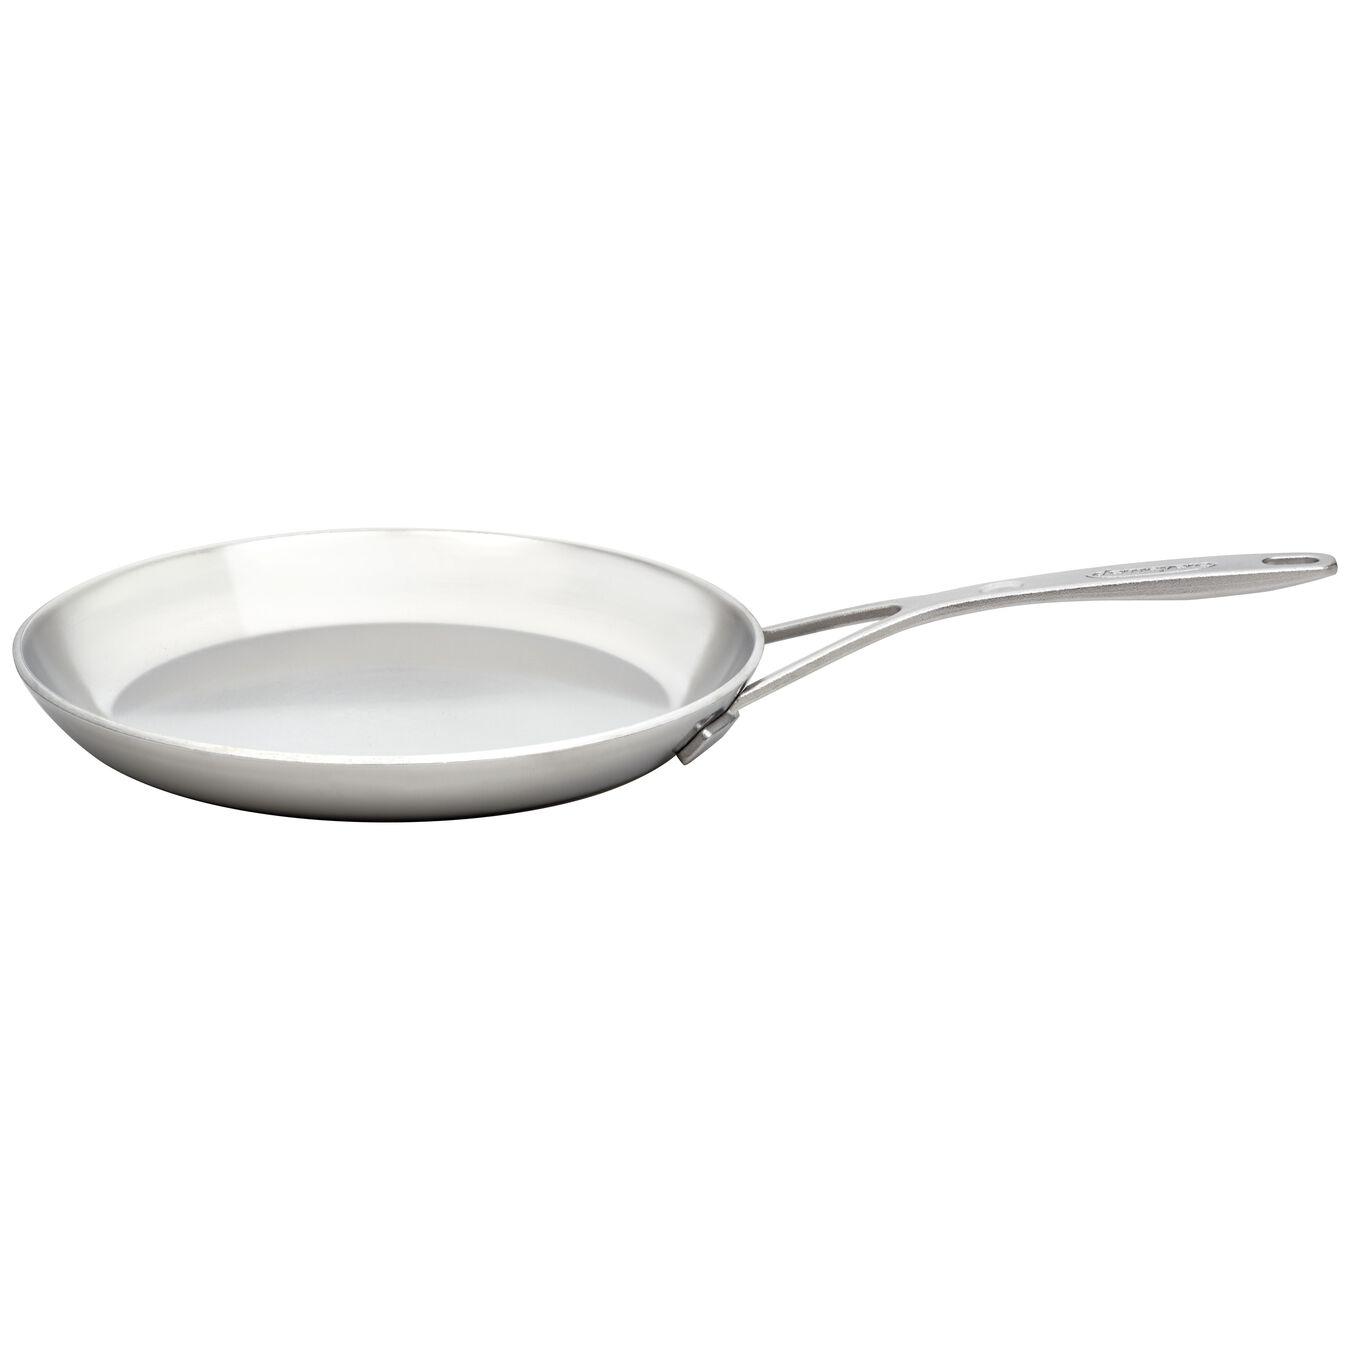 Crêpes-Pfanne 26 cm, 18/10 Edelstahl, Silber,,large 1